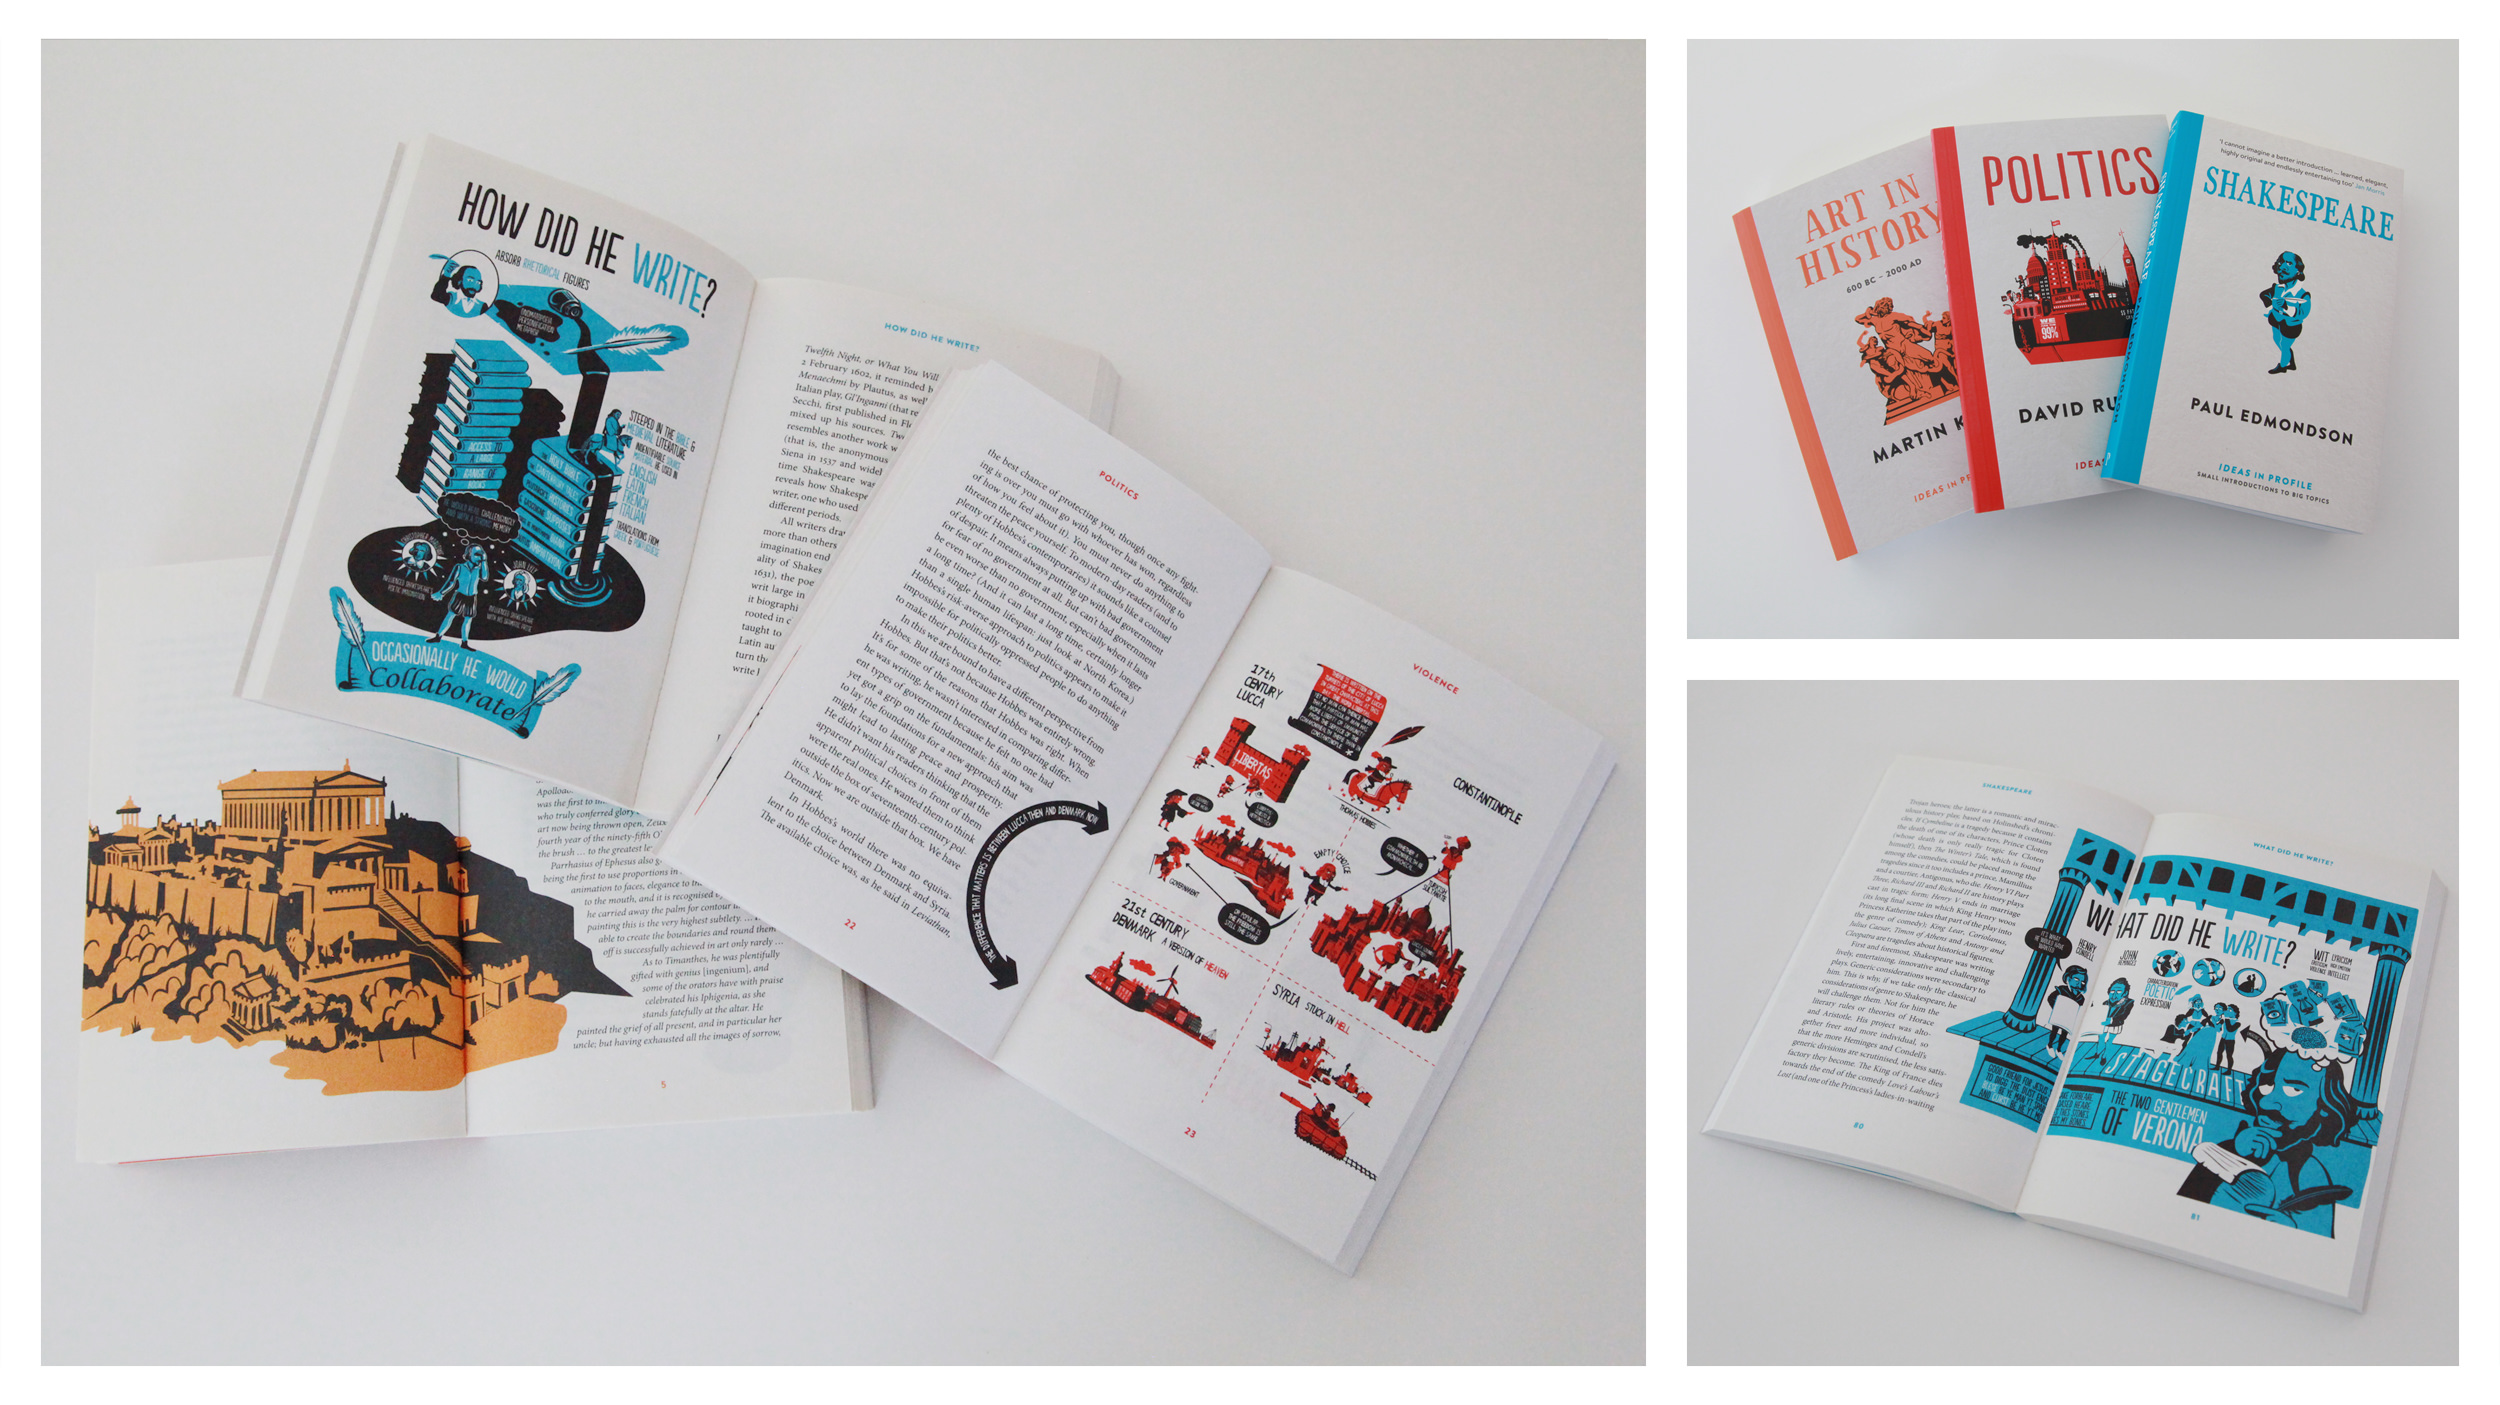 Profile-Books-Cognitive-Media-illustrations1.jpg